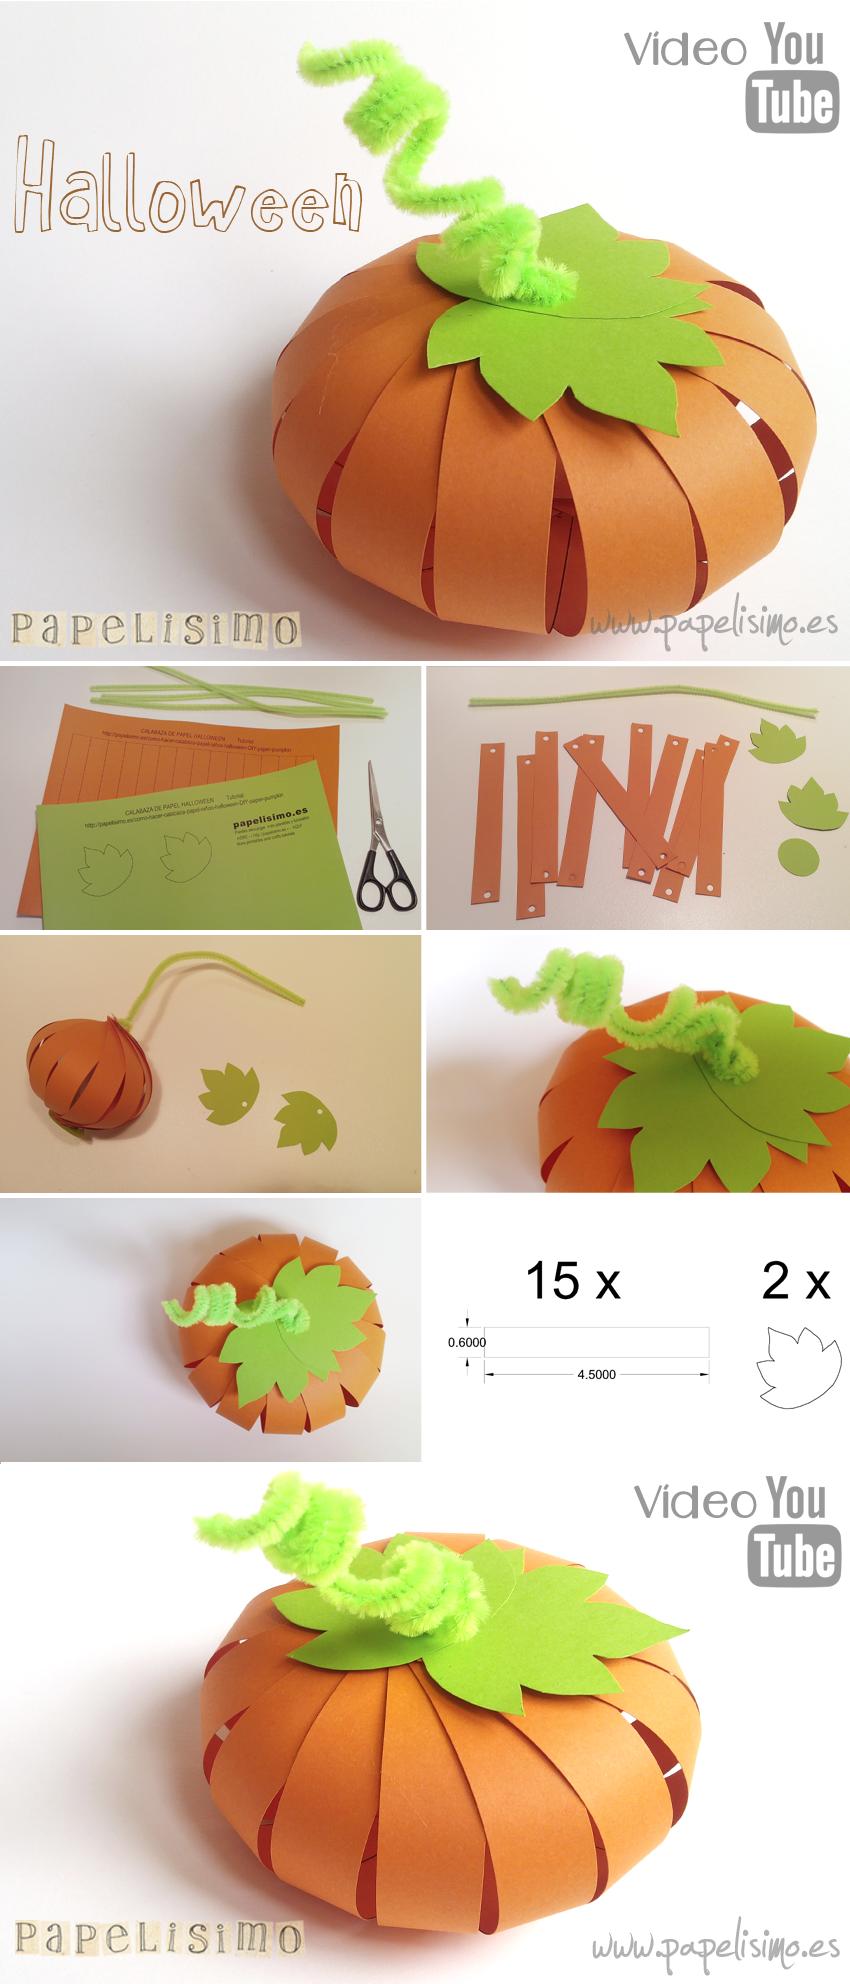 manualidades-faciles-ninos-como-hacer-calabaza-de-papel-halloween-diy-paper-pumpkin-pasos